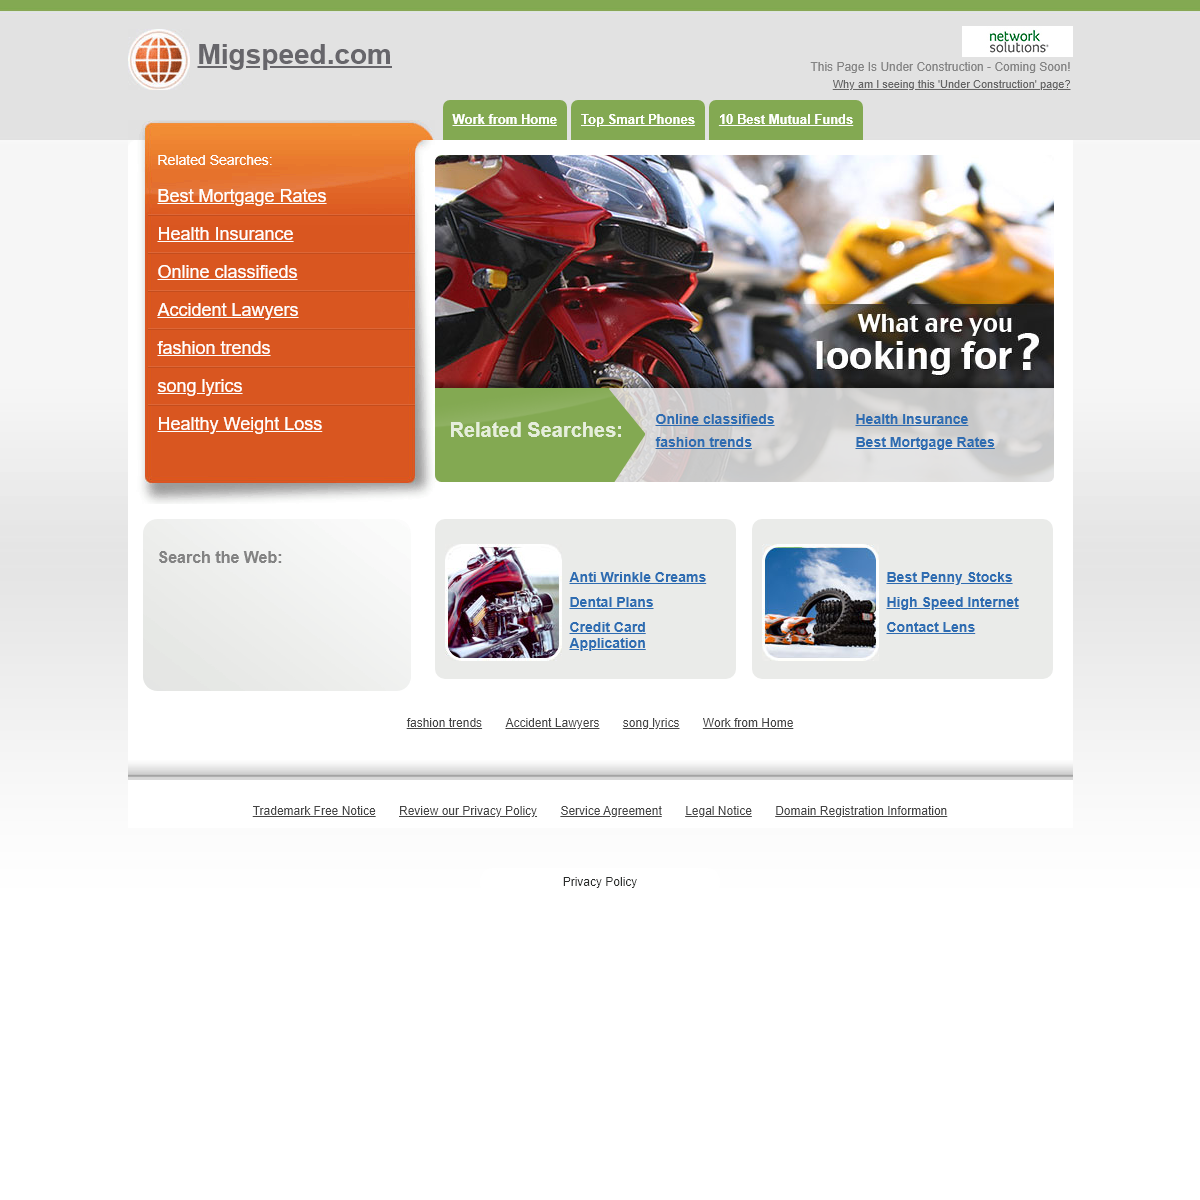 Migspeed.com